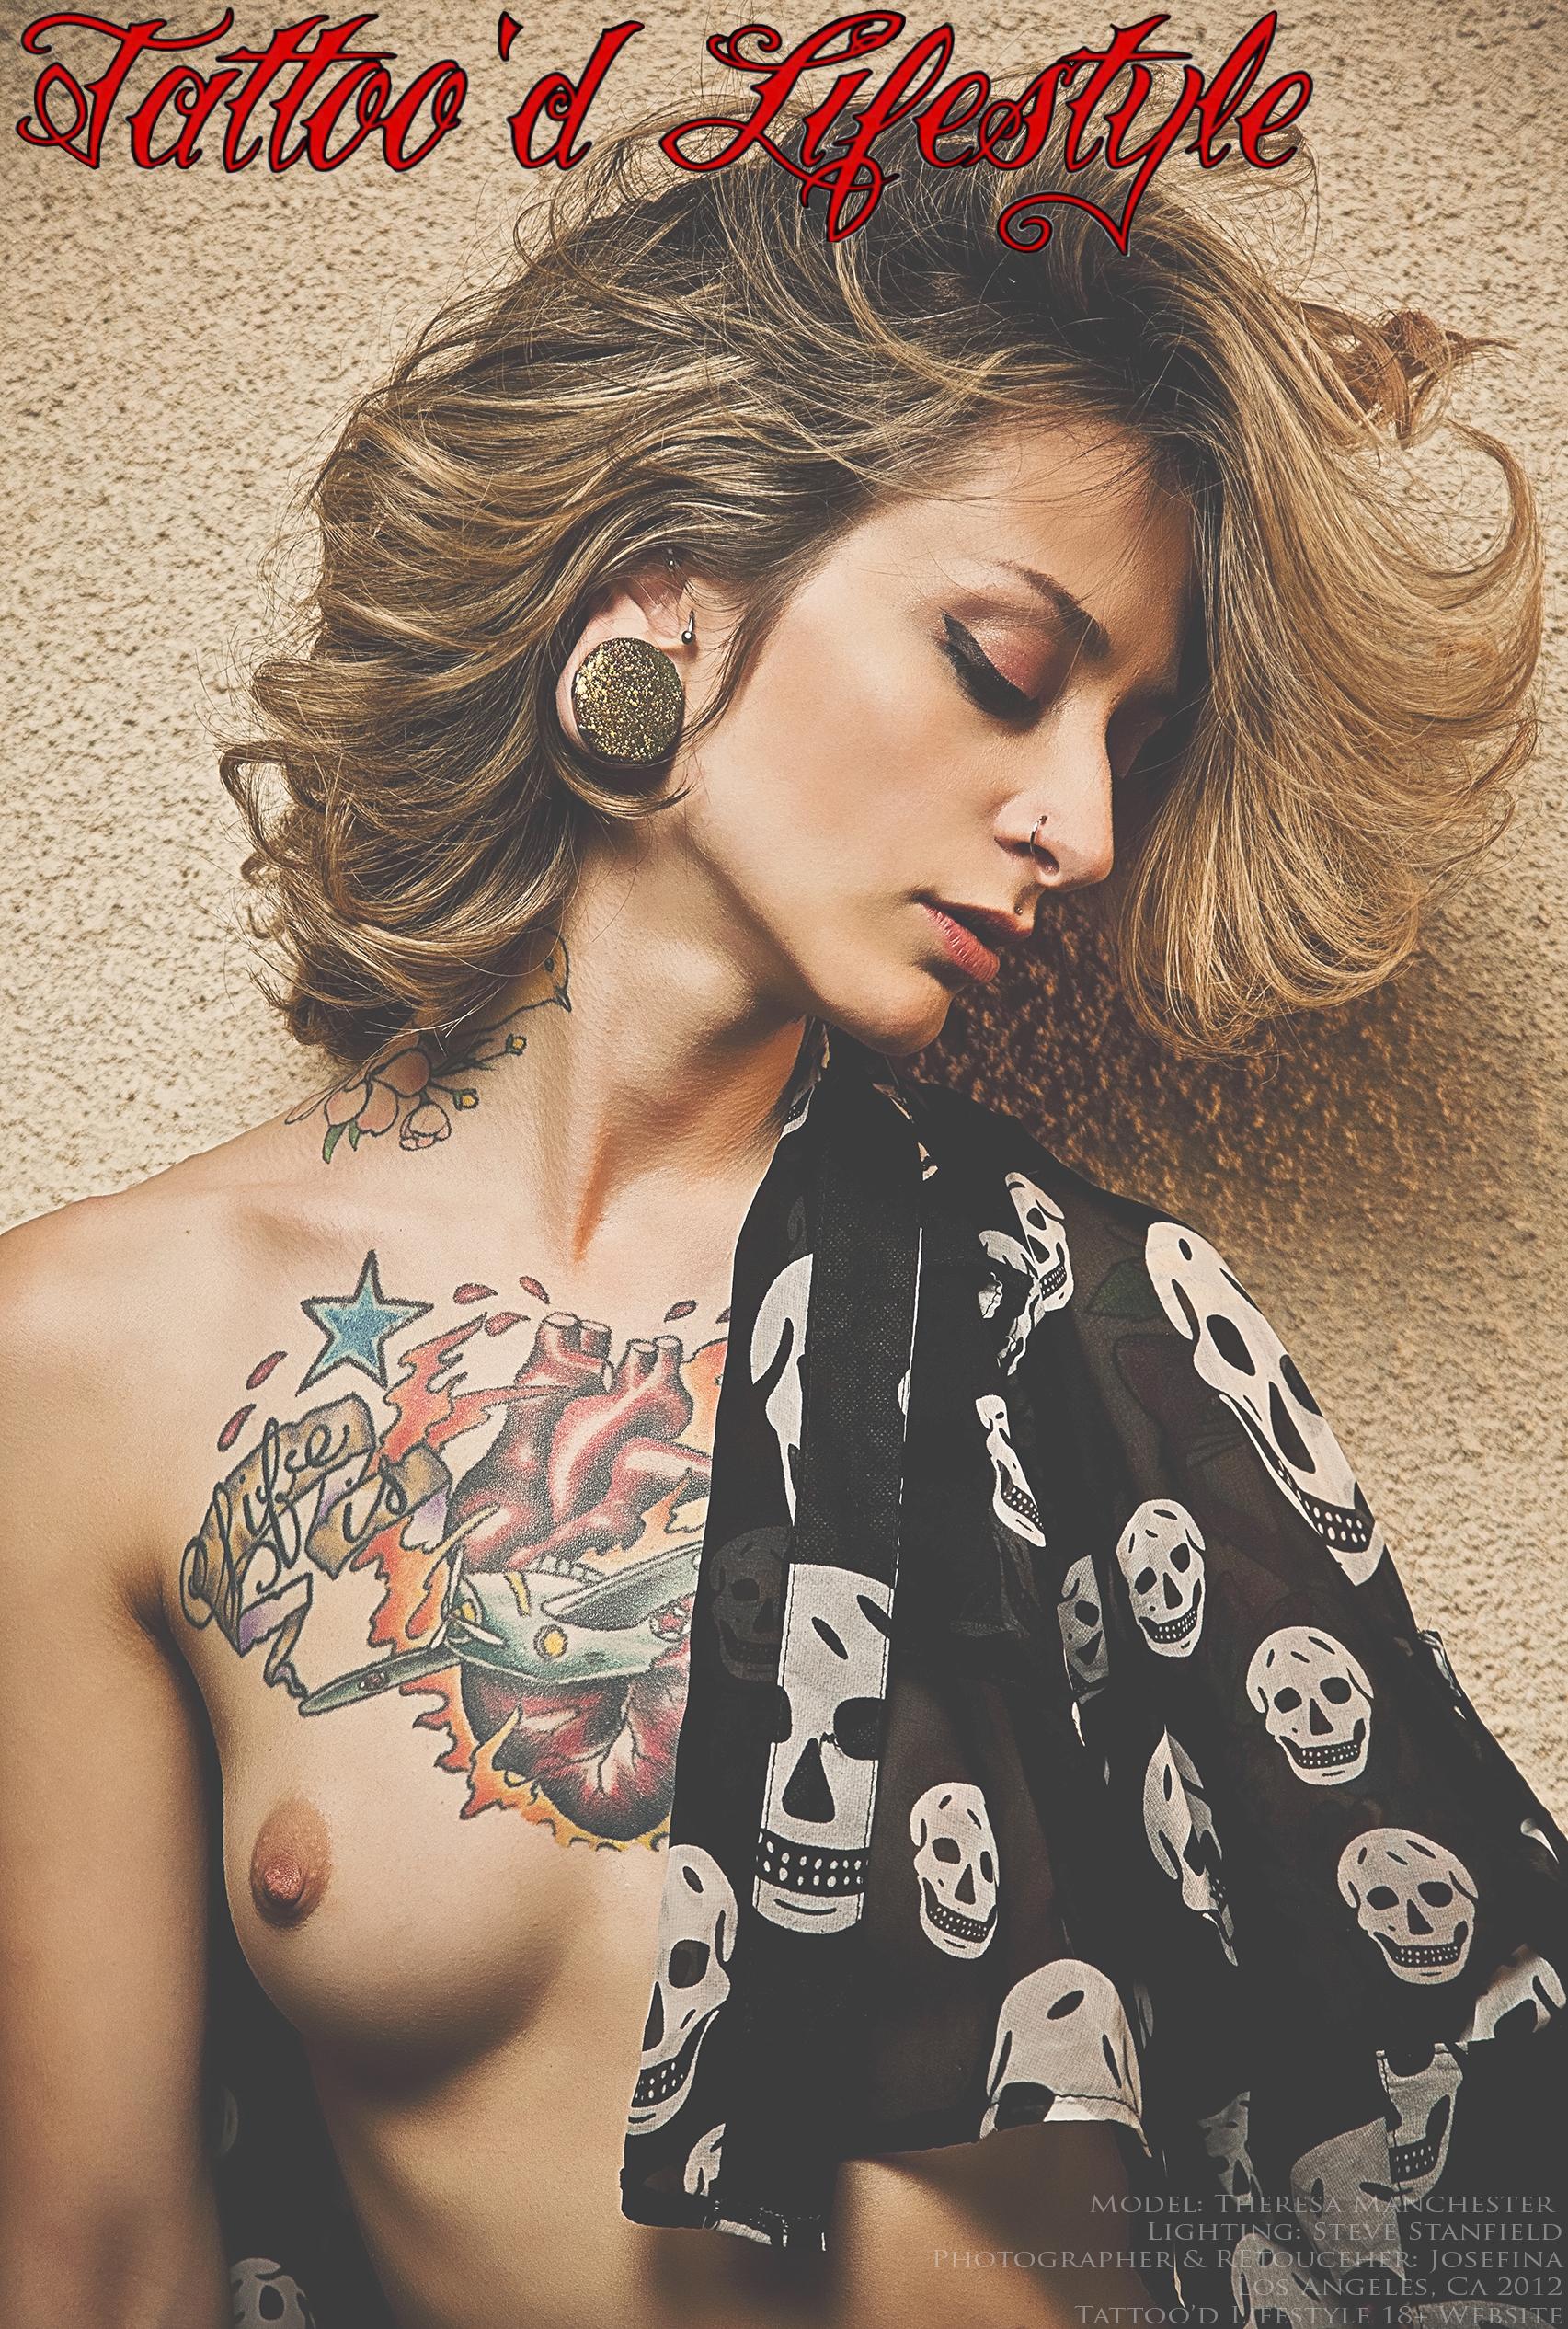 Tattoo'd Lifestyle Online